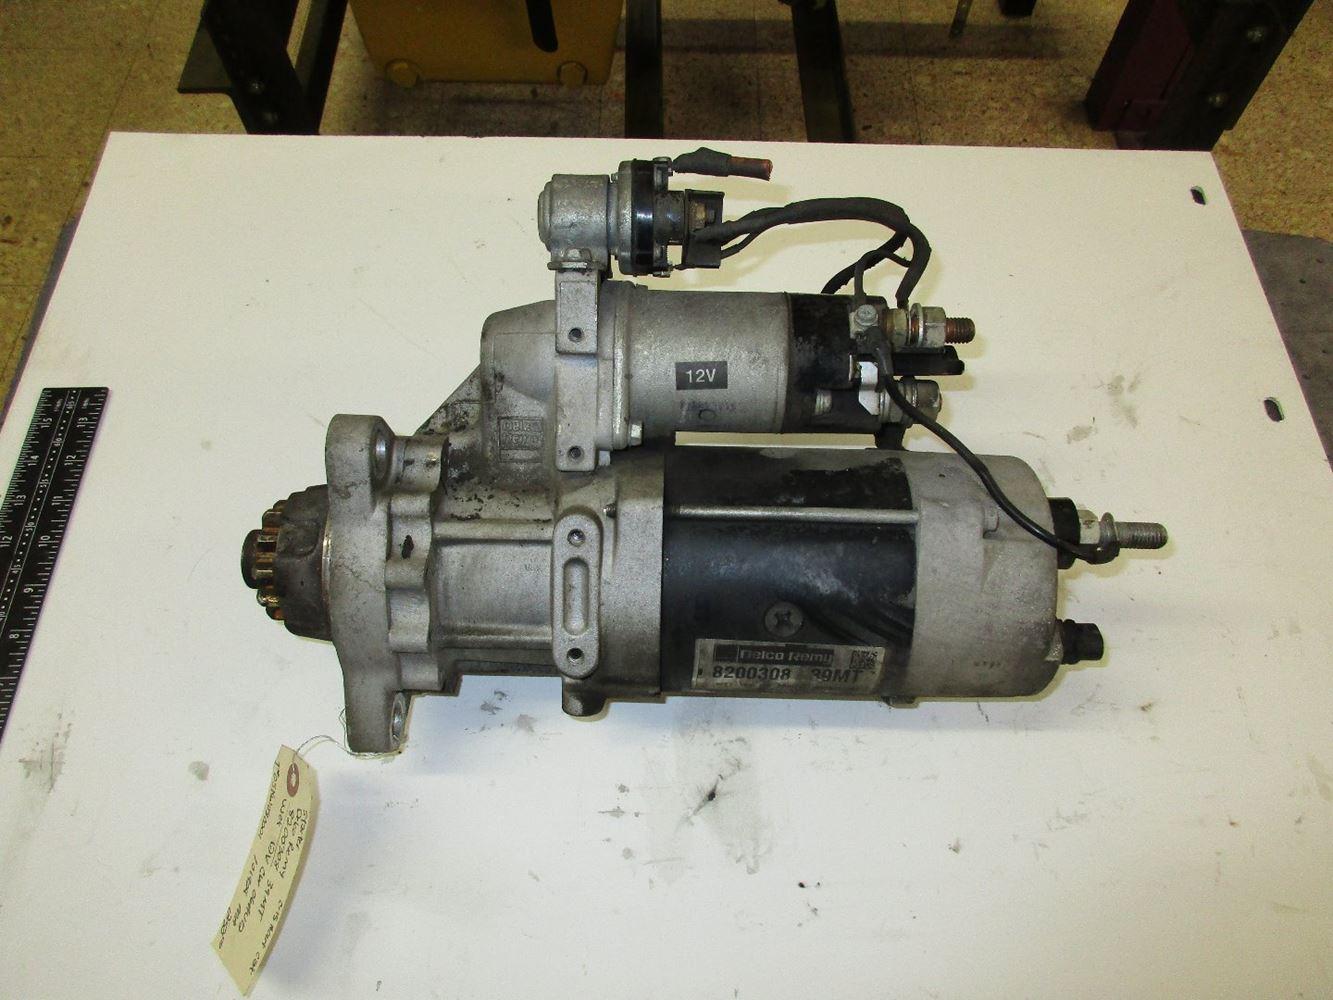 Caterpillar Starter Wiring Diagram On 3208 Cat Engine Wiring Diagram